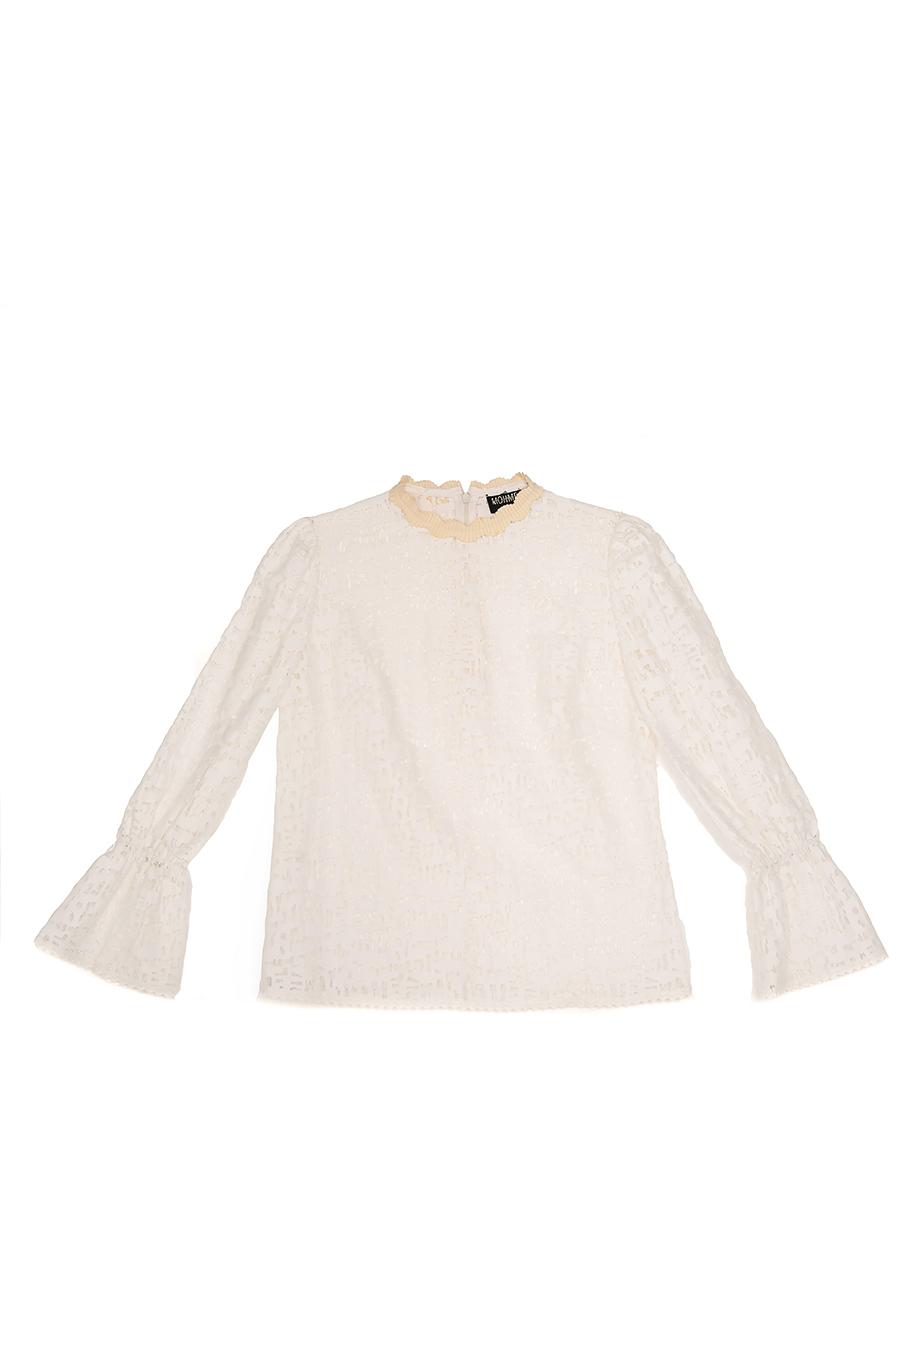 TISSE blouse